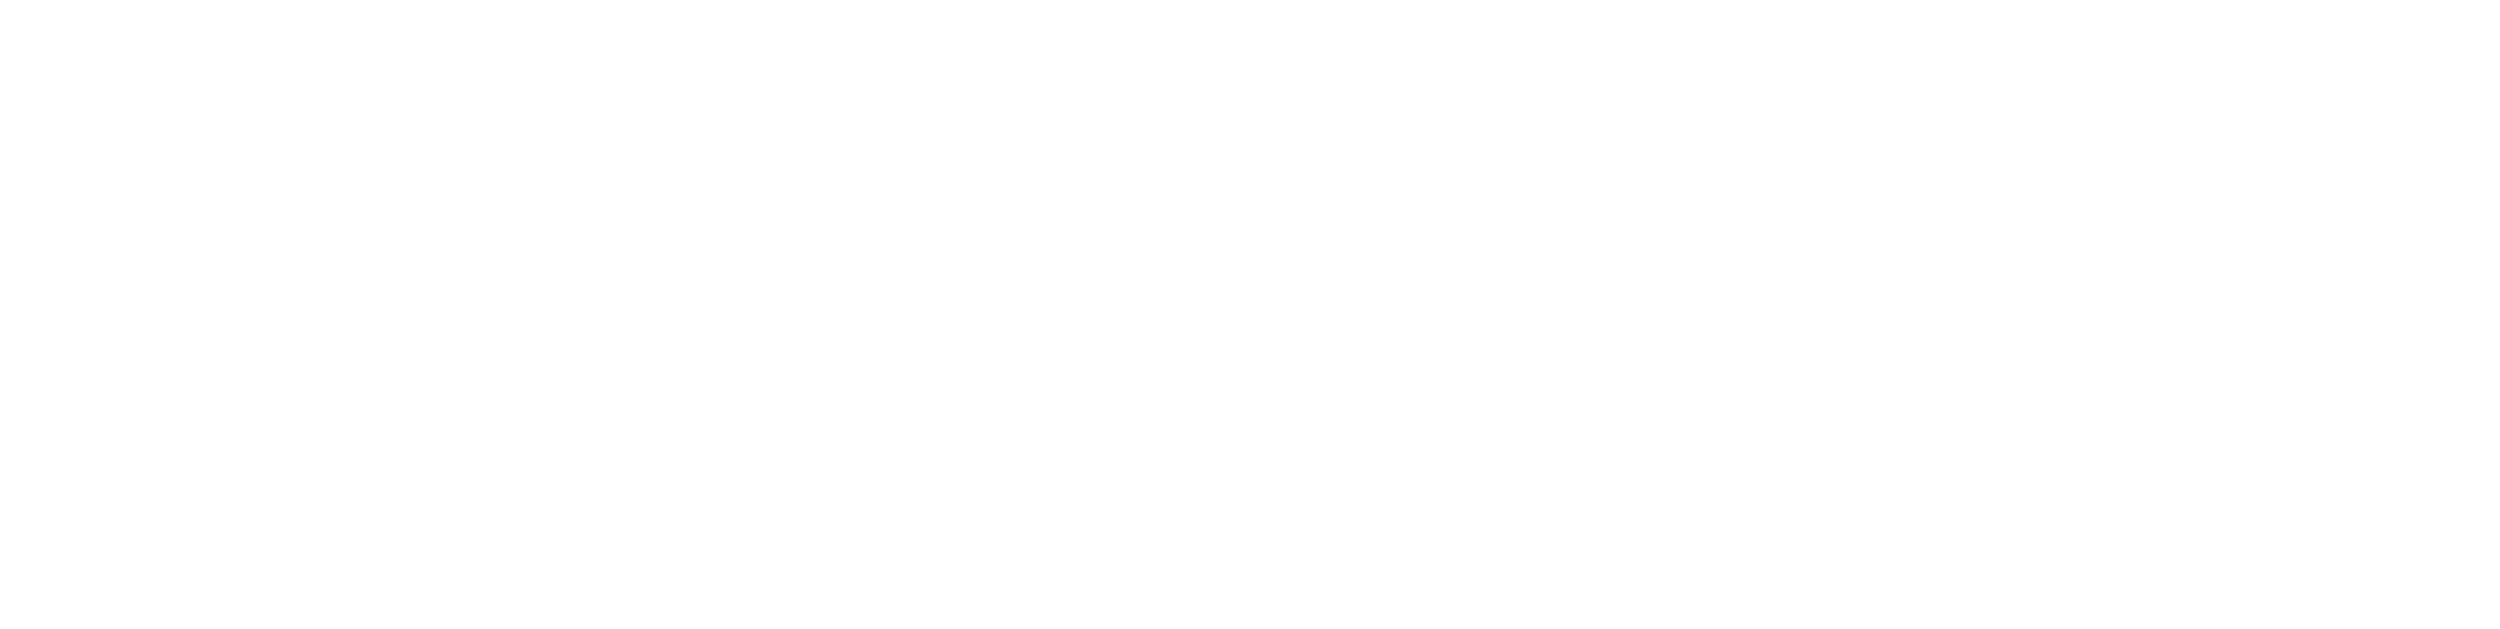 nfa-logo-web.png